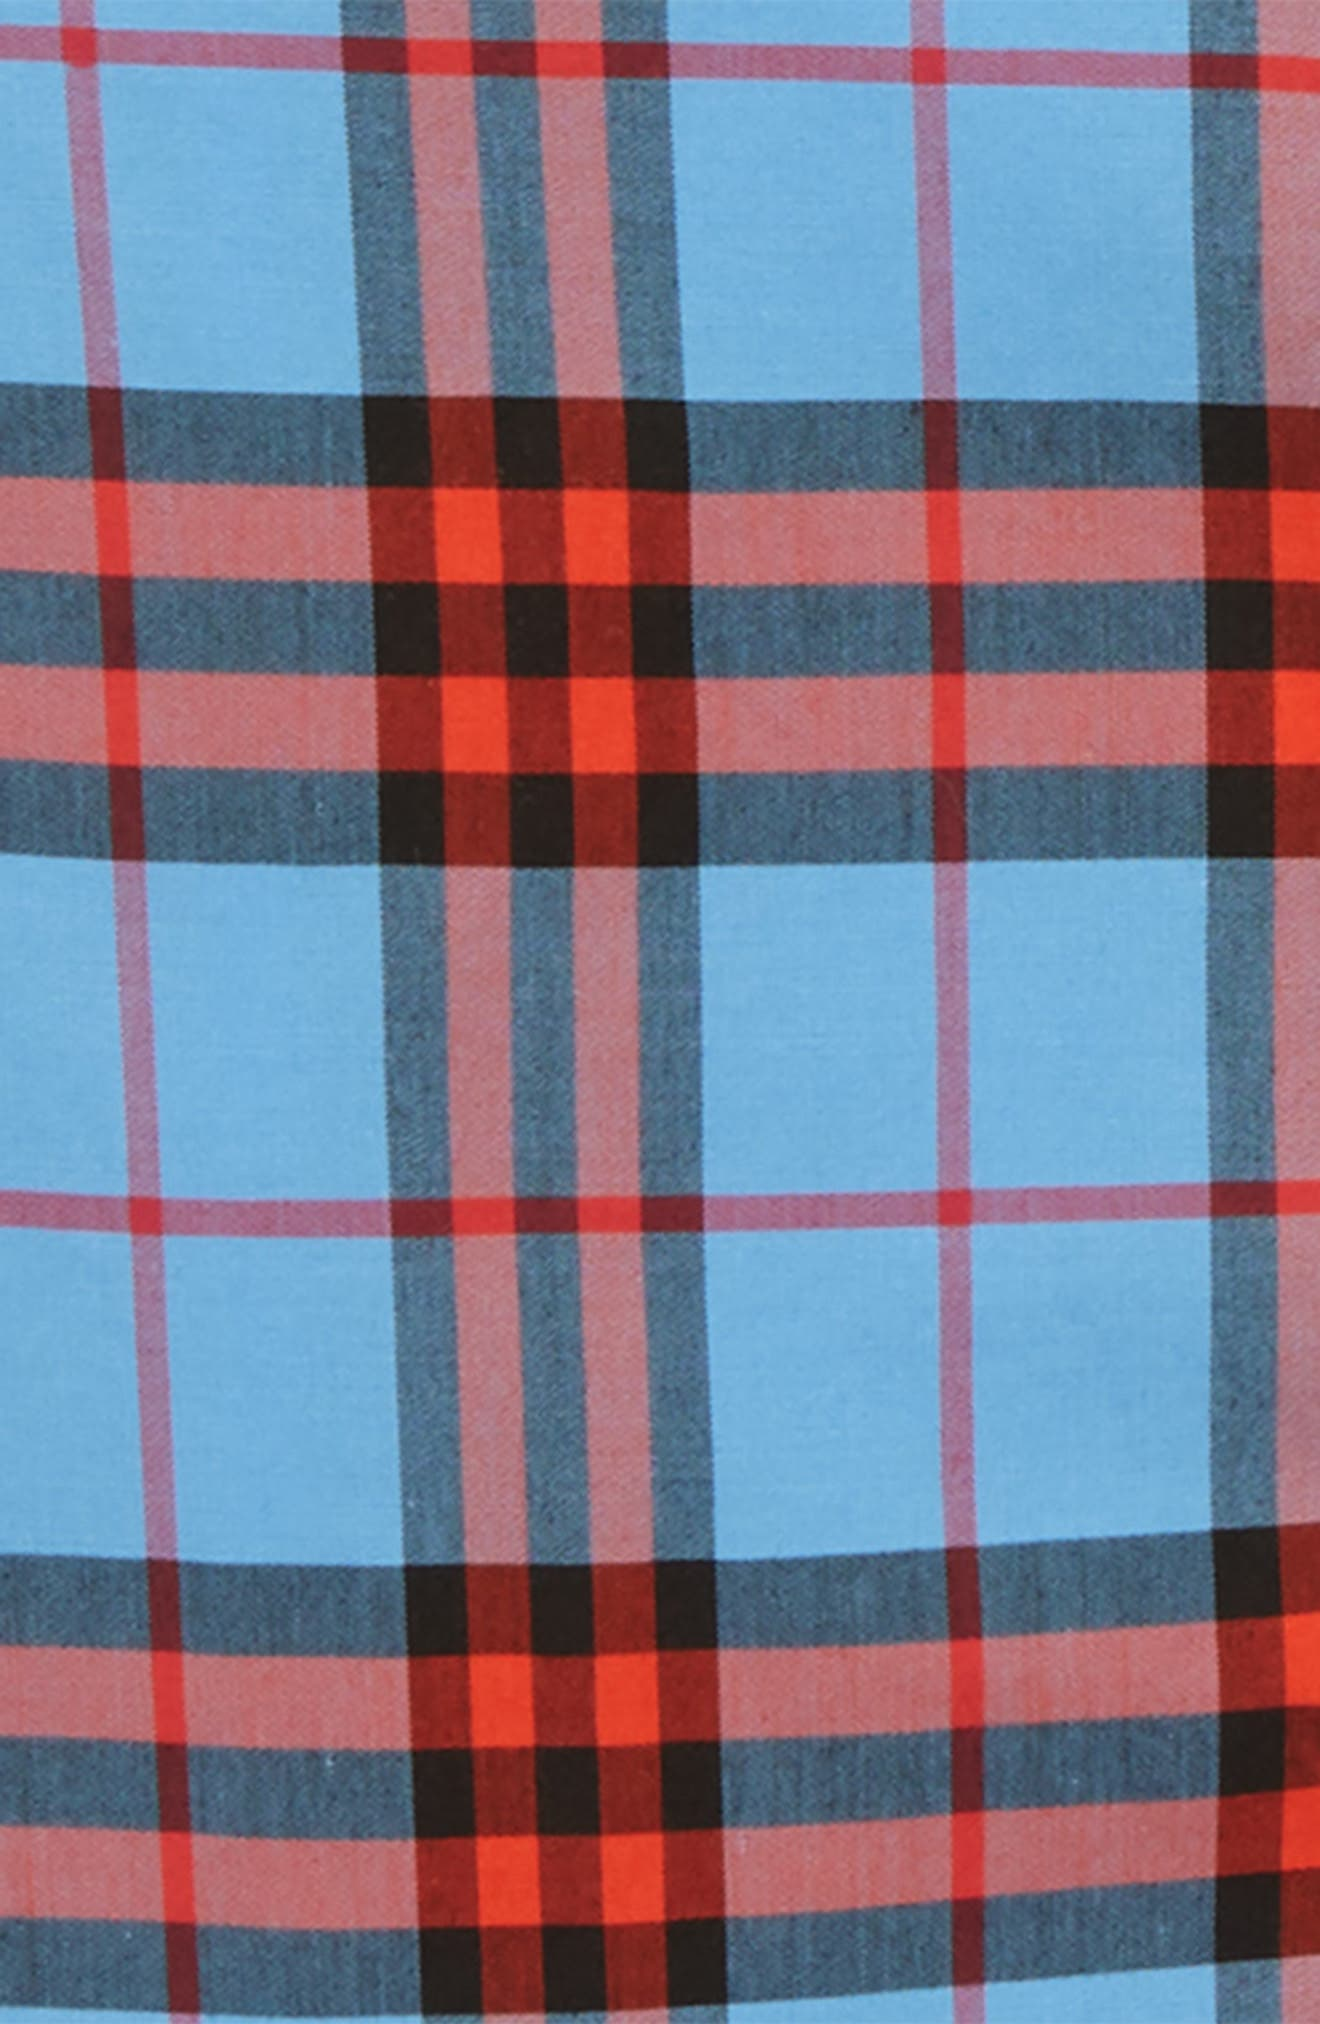 Clarkey Plaid Woven Shirt,                             Alternate thumbnail 2, color,                             CORNFLOWER BLUE